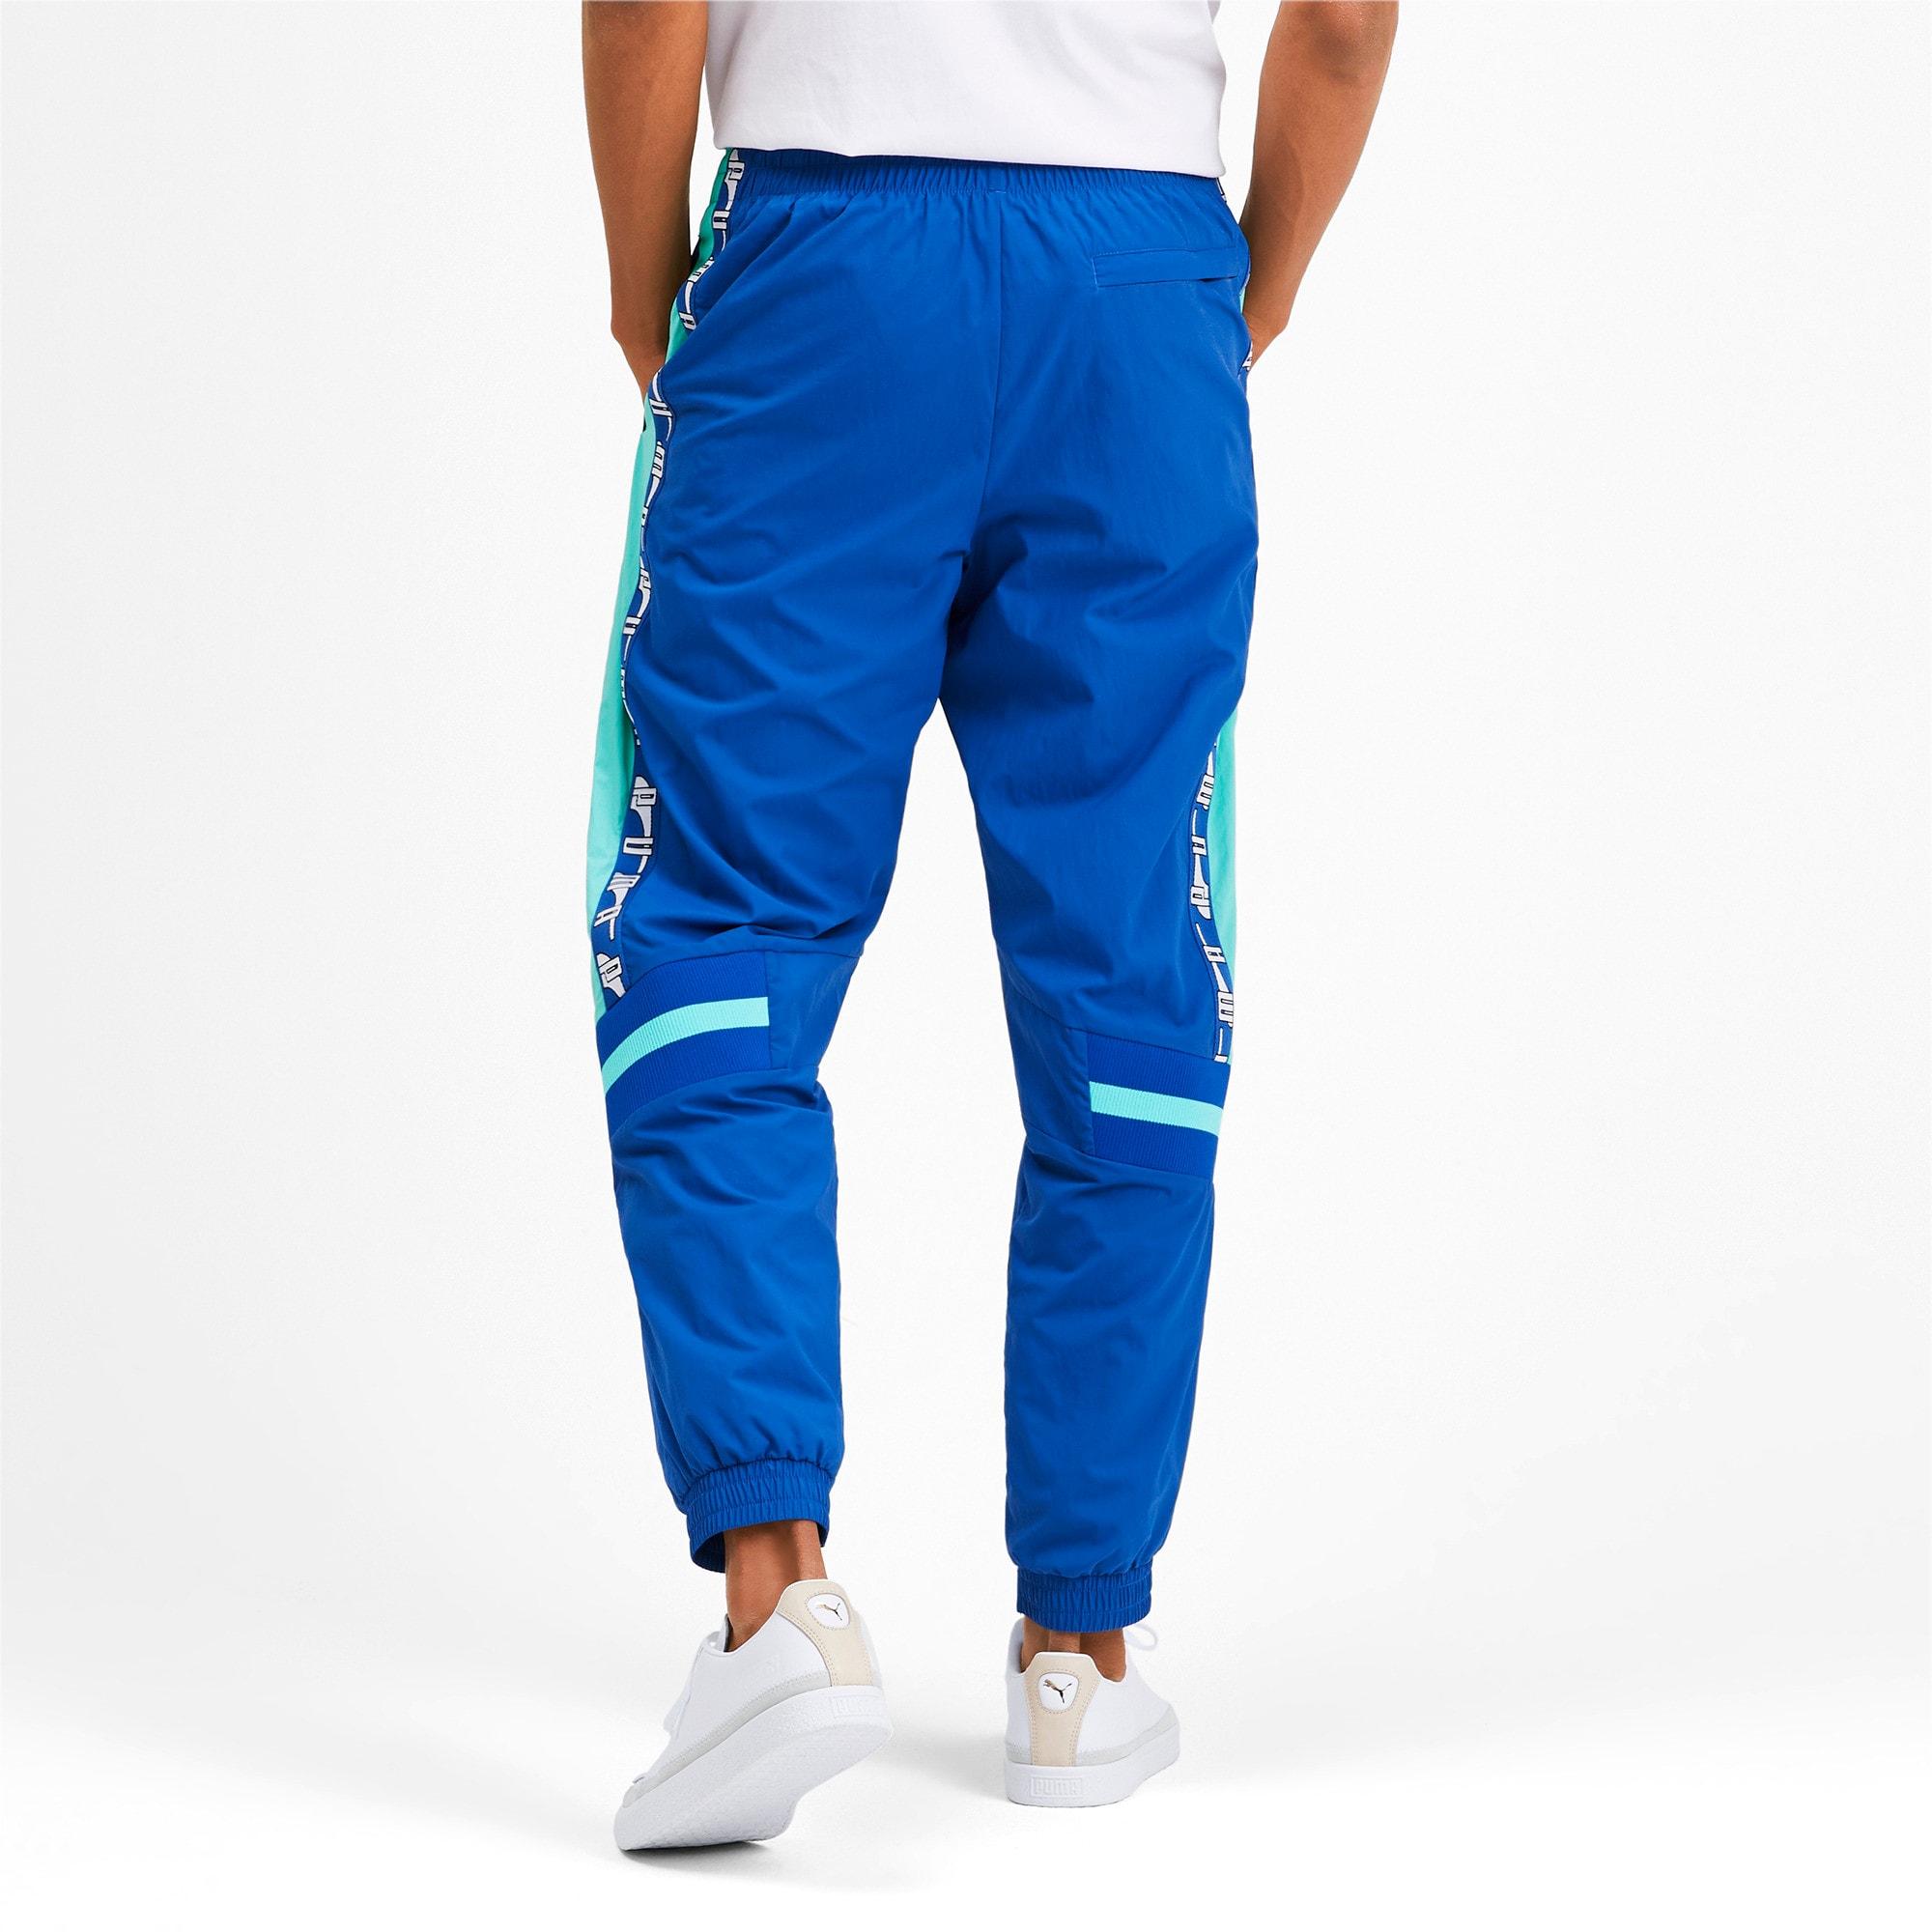 Thumbnail 3 of PUMA XTG Men's Woven Pants, Galaxy Blue, medium